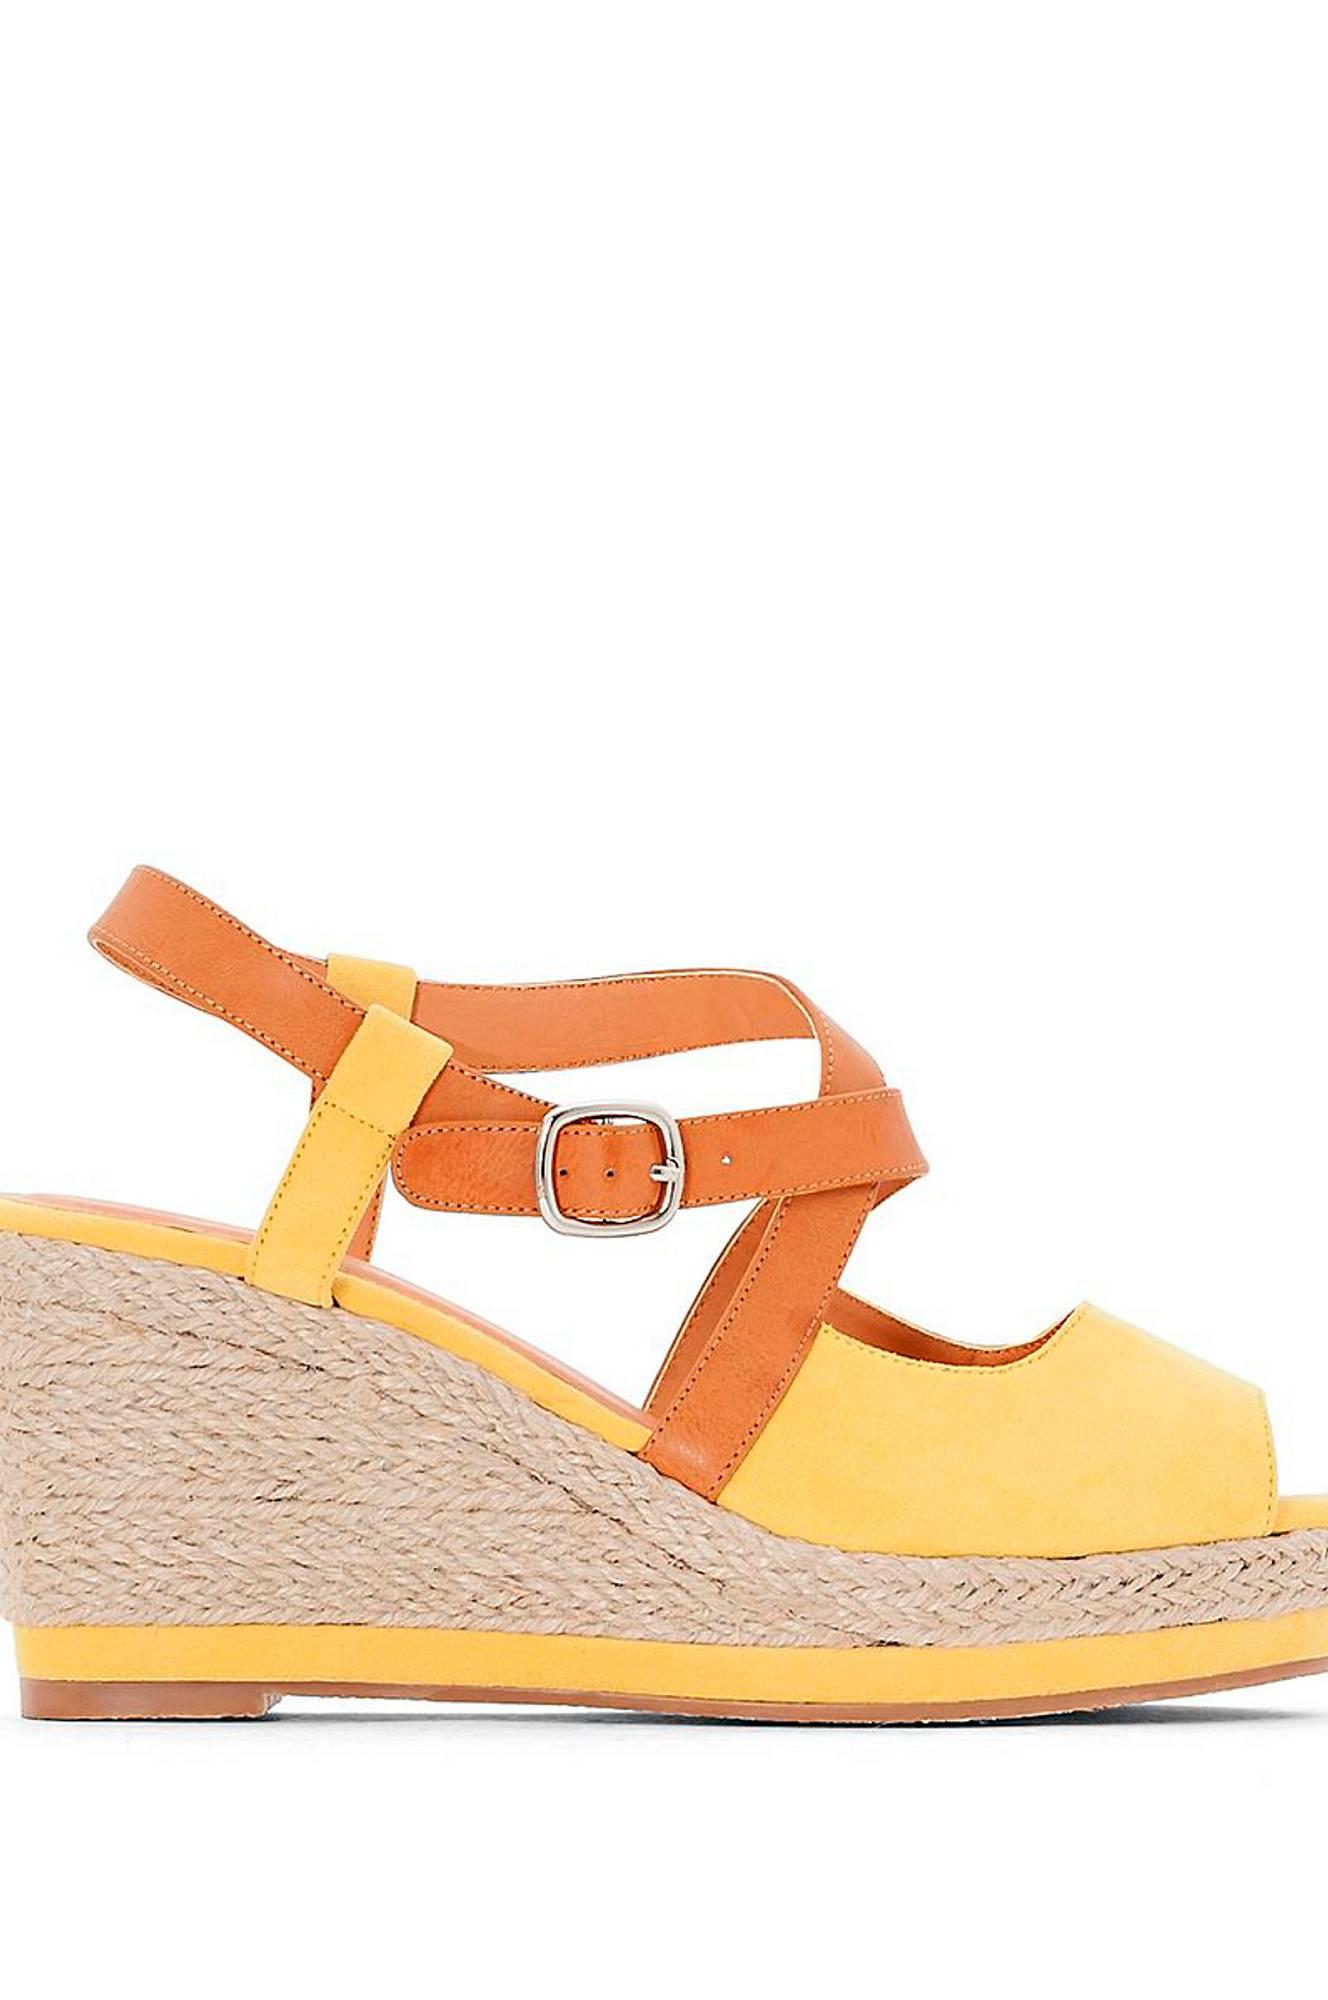 Kaksiväriset sandaletit, joissa kiilakorko